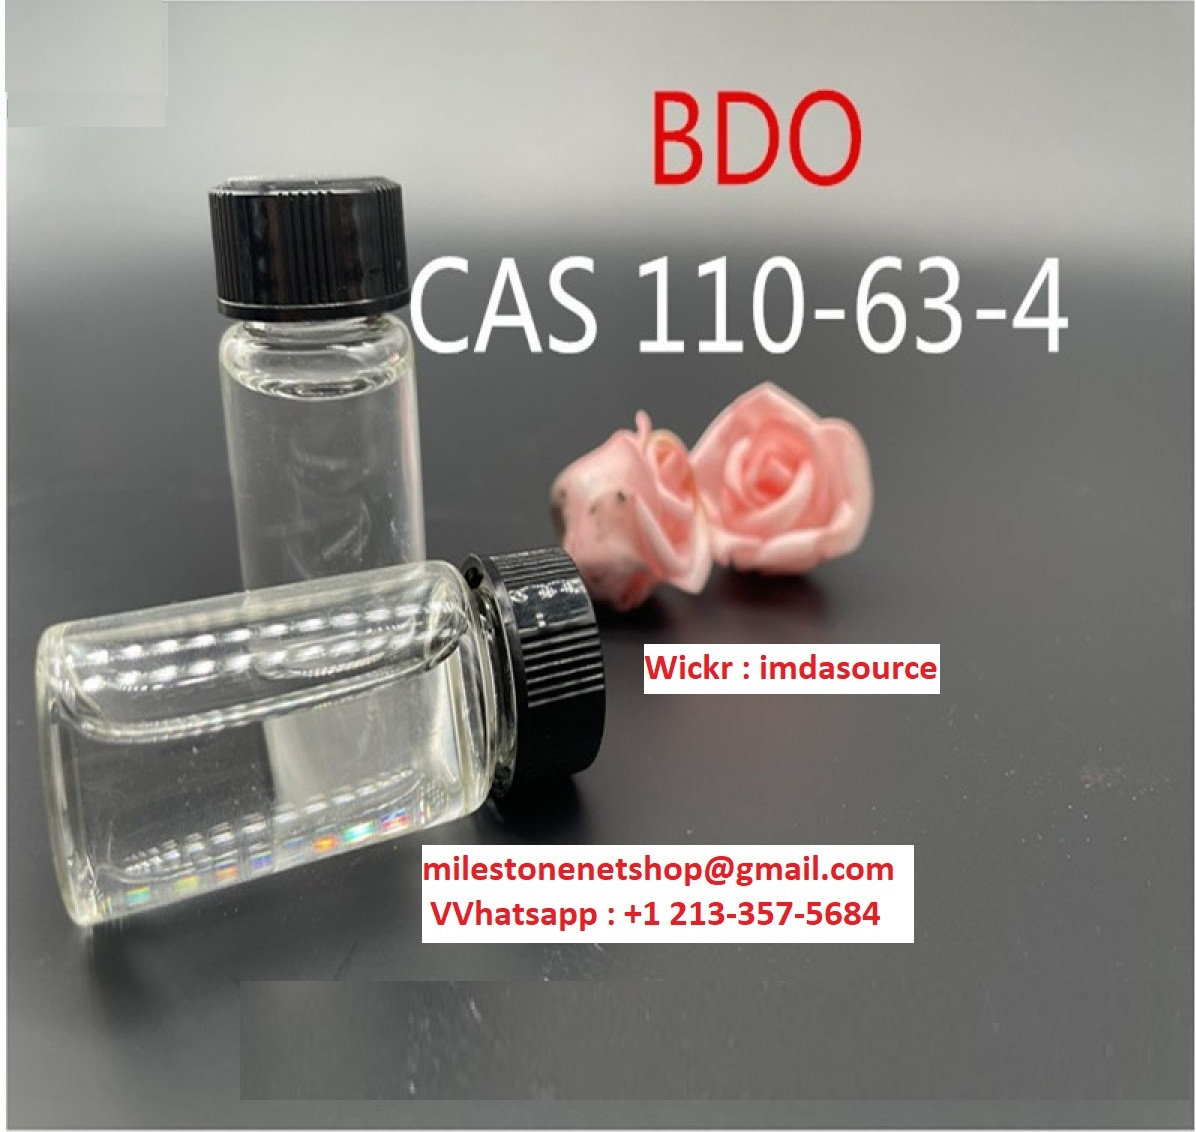 Buy 1.4 butanediol (BDO) 1000ml cleaner online